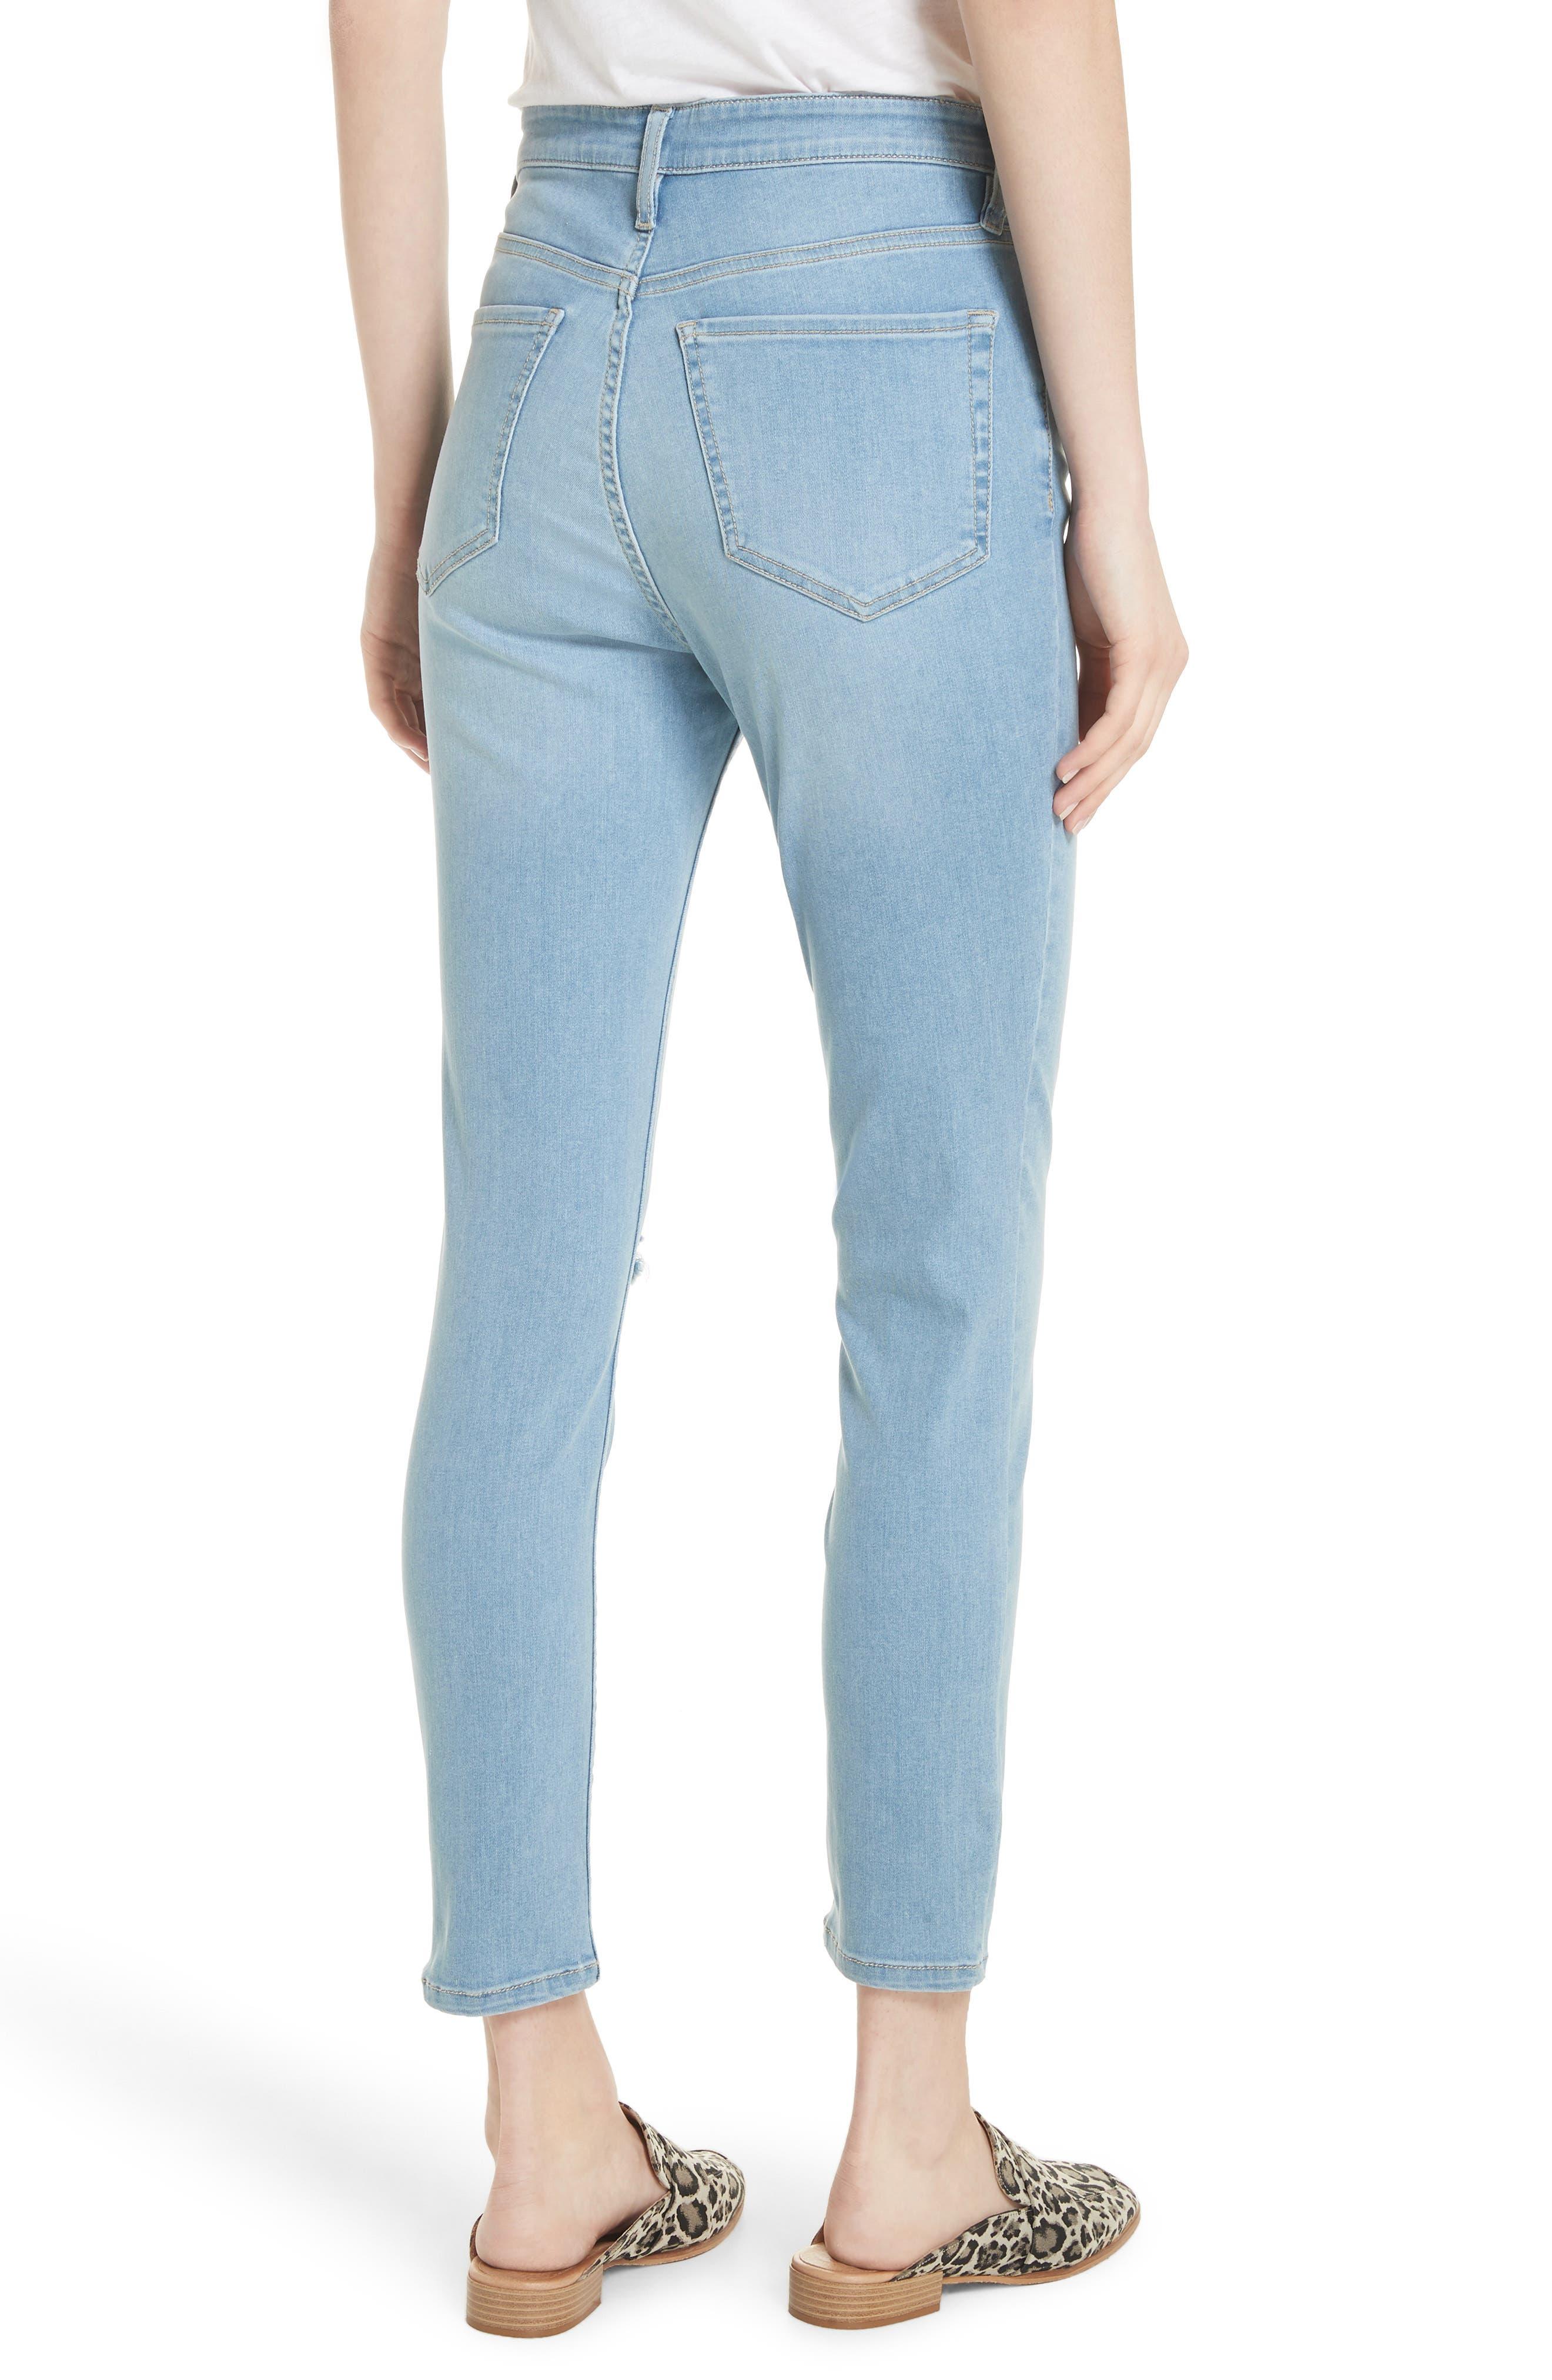 Mara Skinny Jeans,                             Alternate thumbnail 2, color,                             Blue